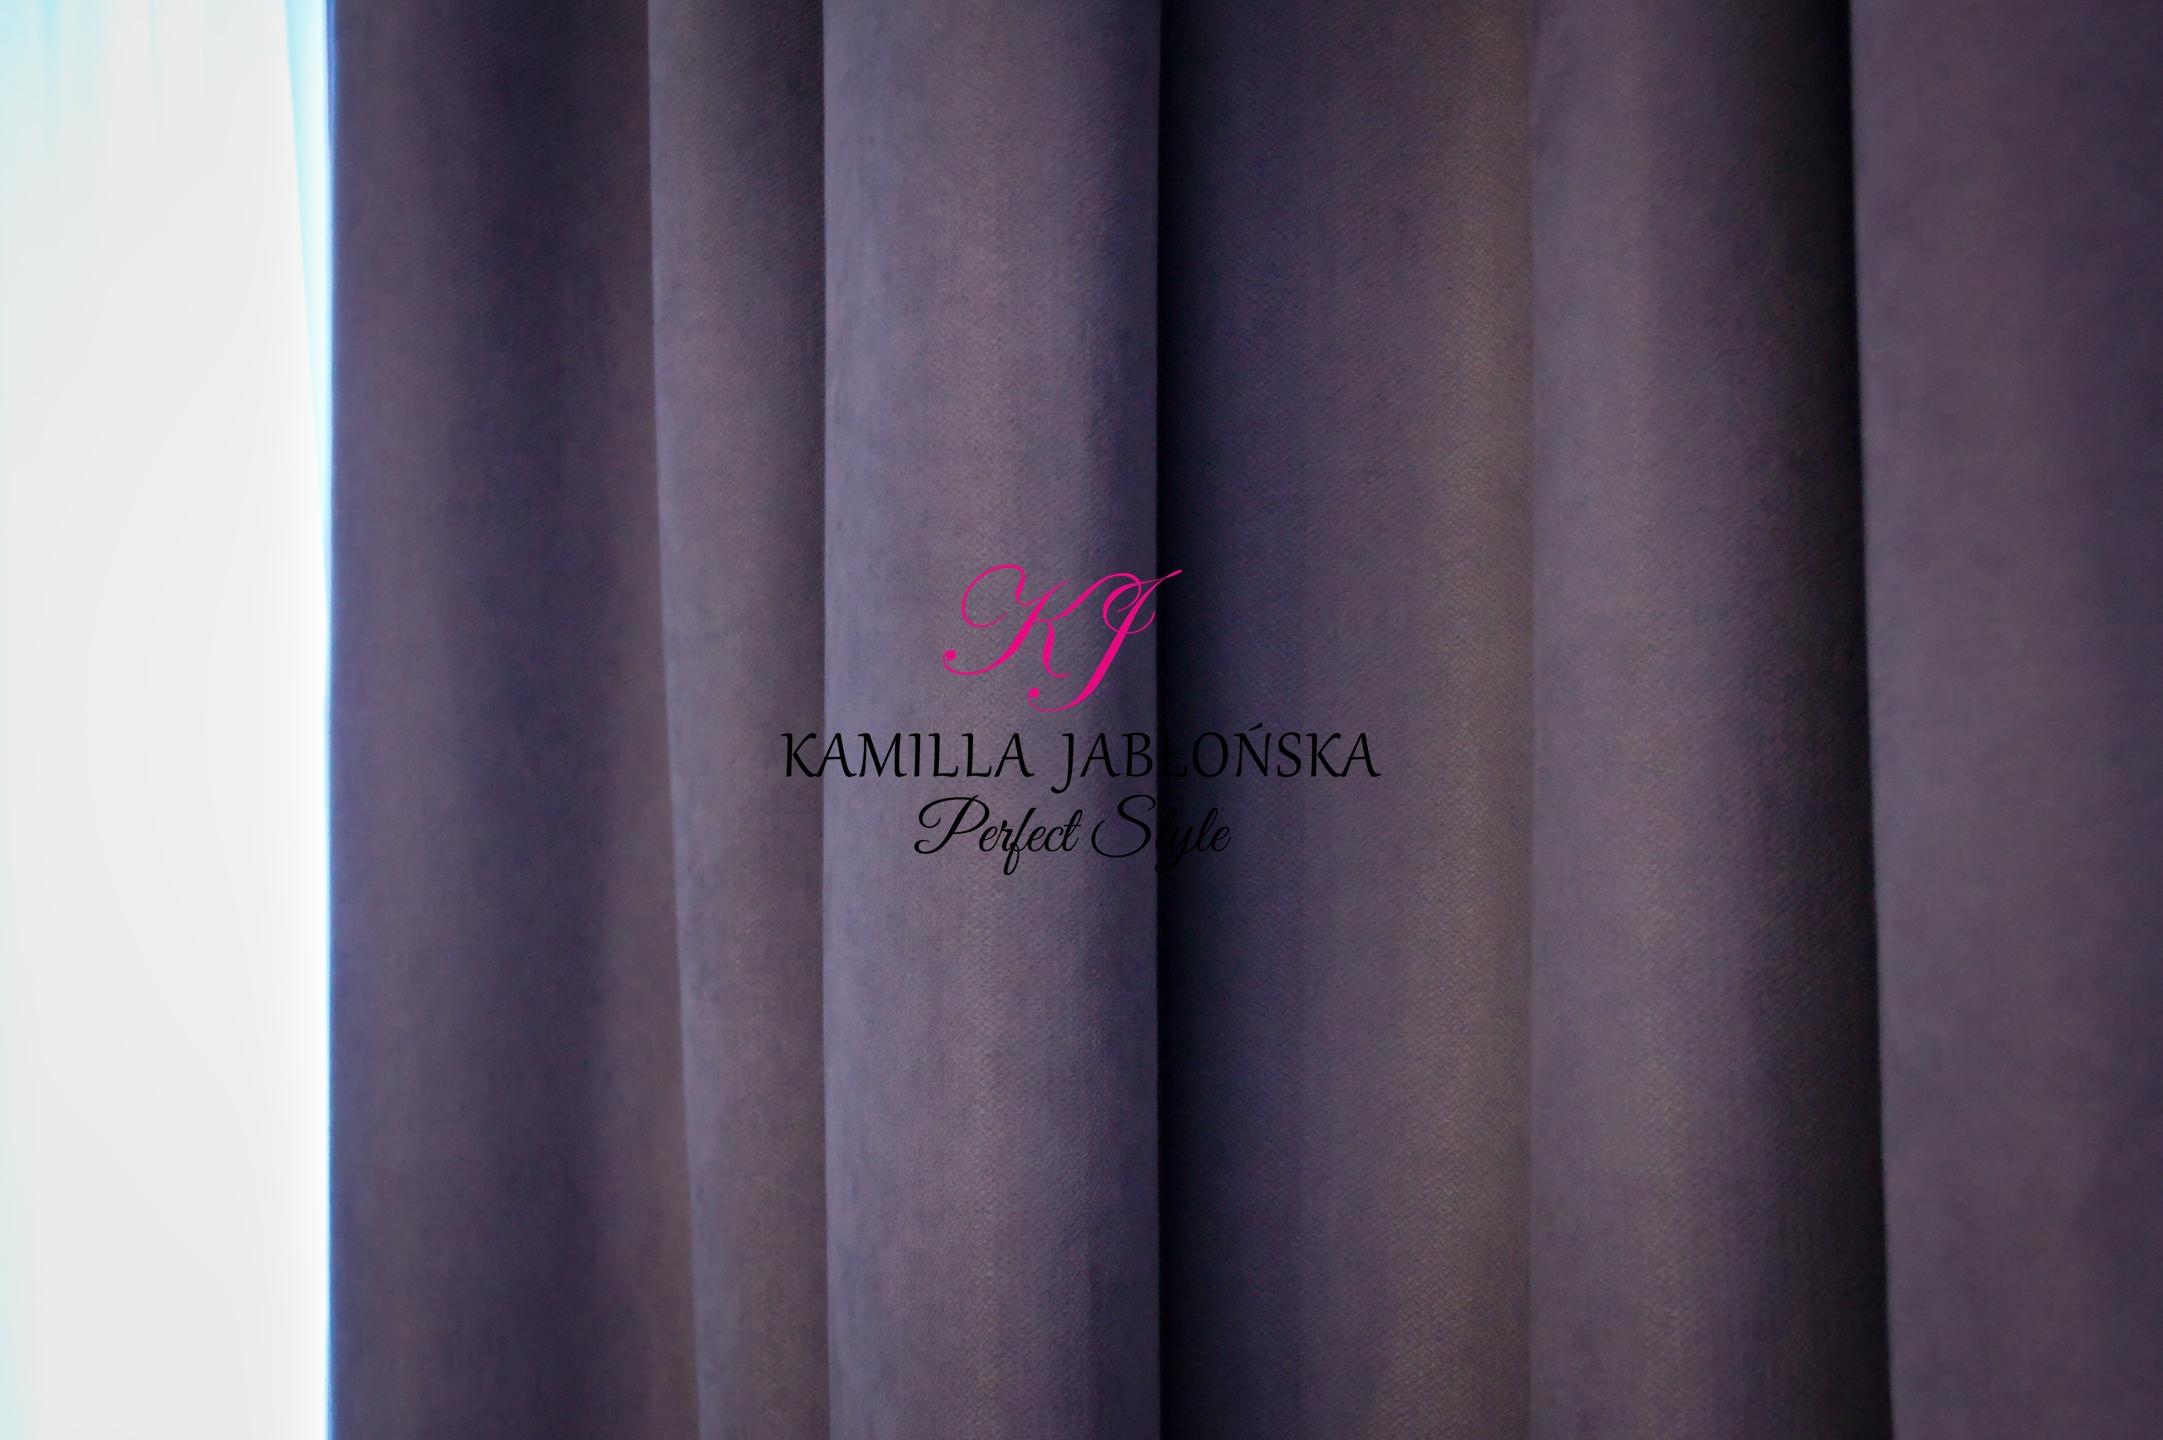 012Perfect Style Kamilla Jabłońska